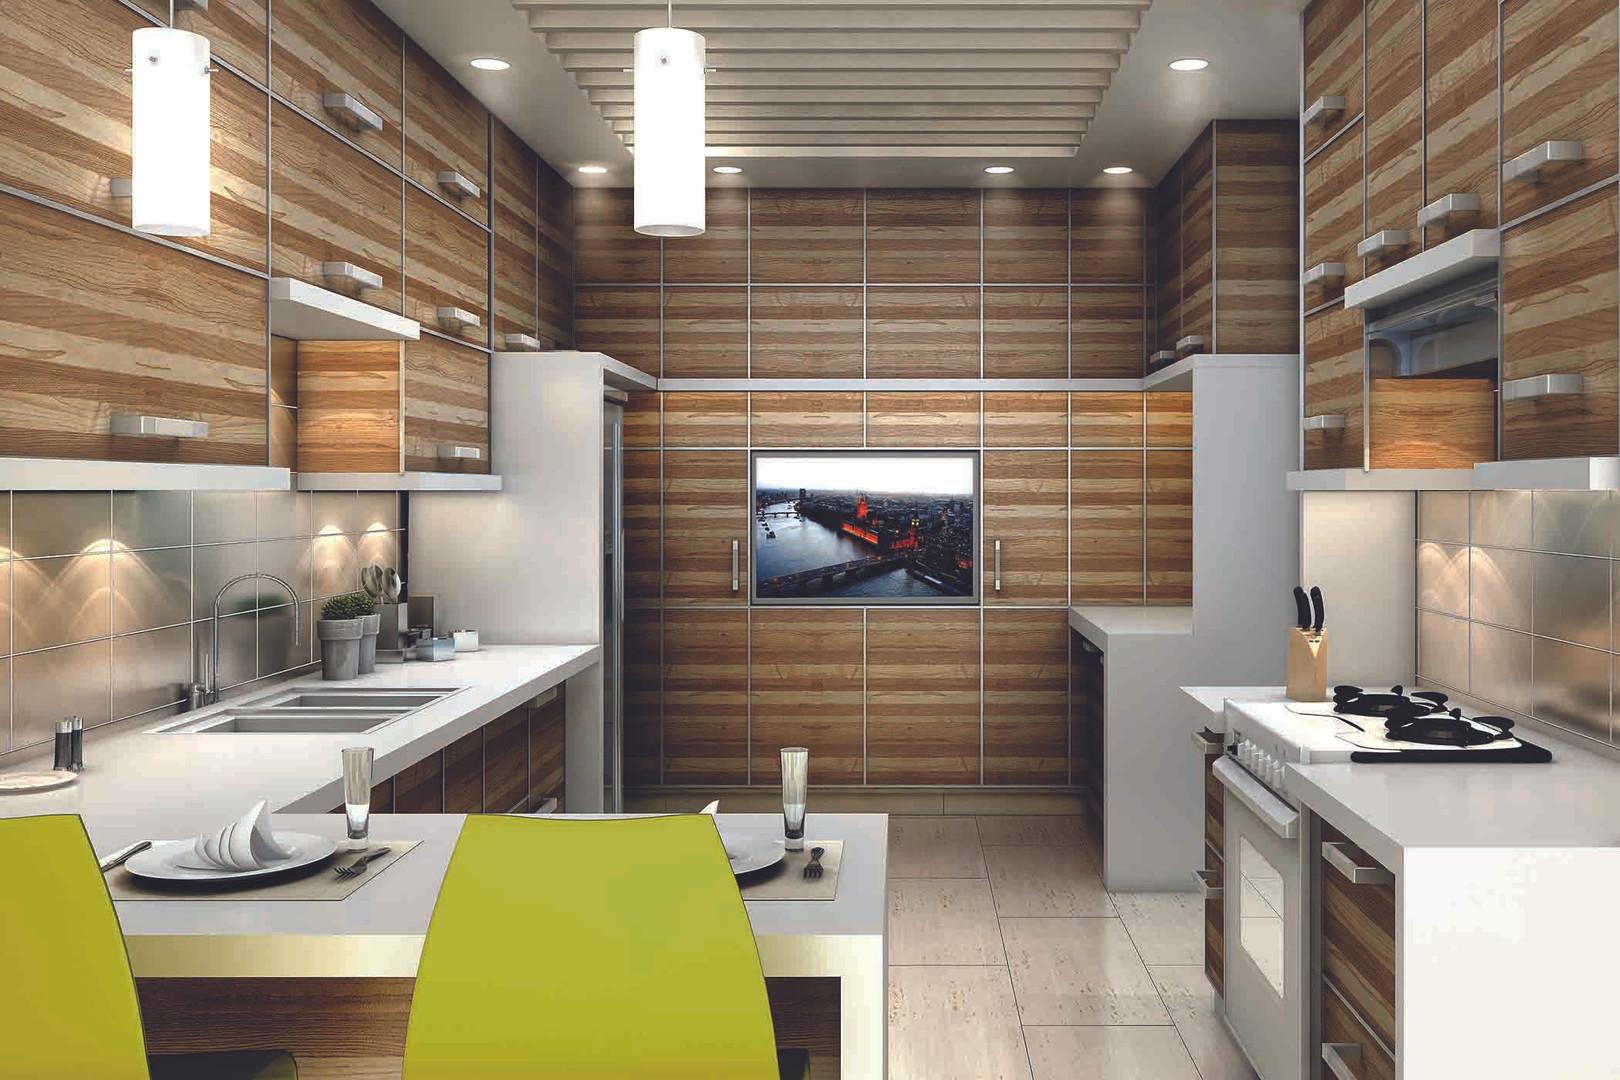 ADCC-Portfolio-BurjPacific-Kitchen-02.jp